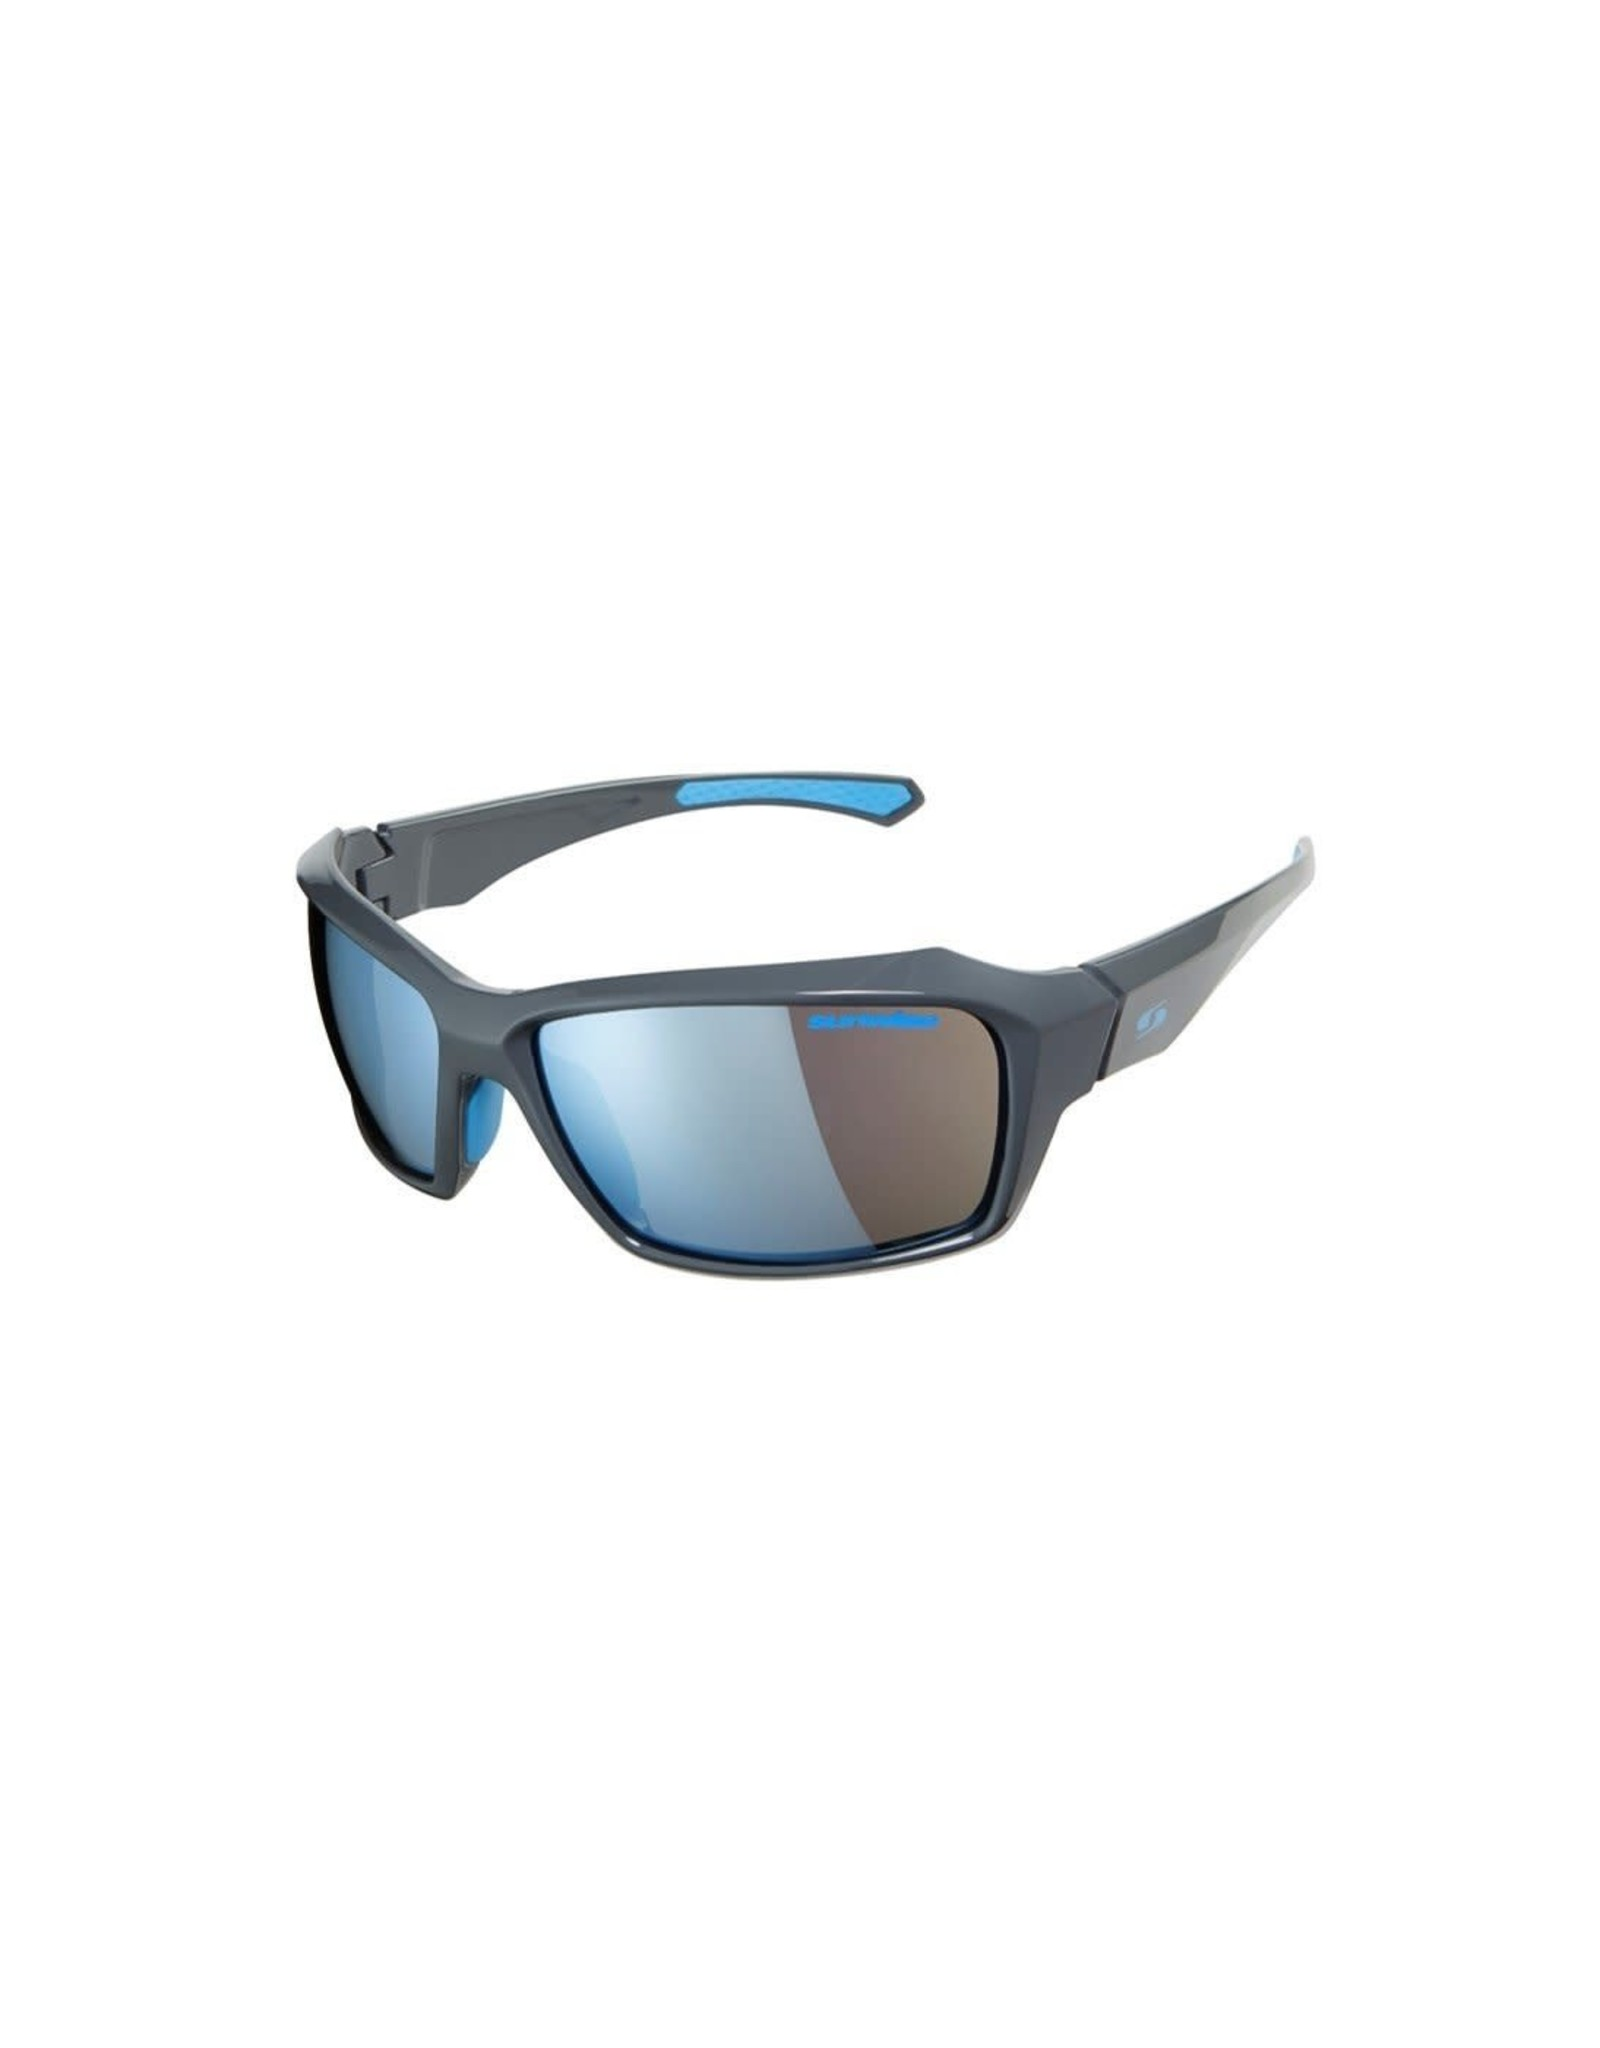 Sunwise Summit Cycling Sunglasses GREY